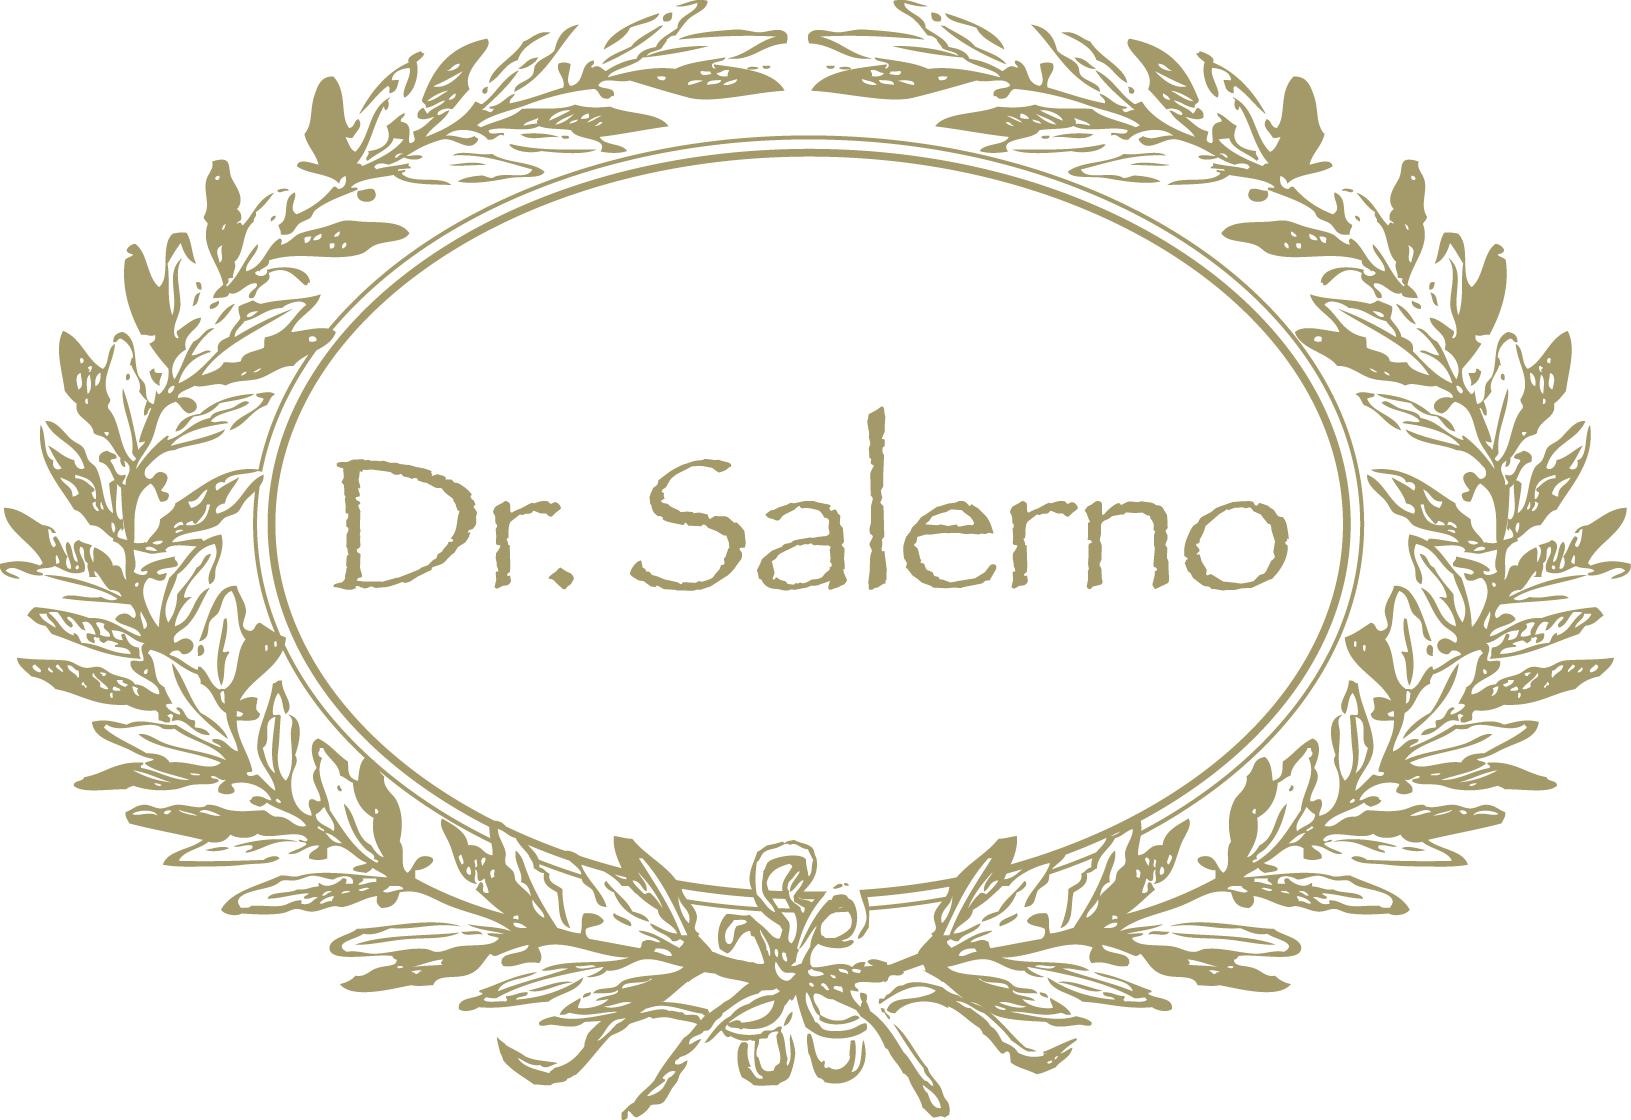 Dr. Salerno IVthera